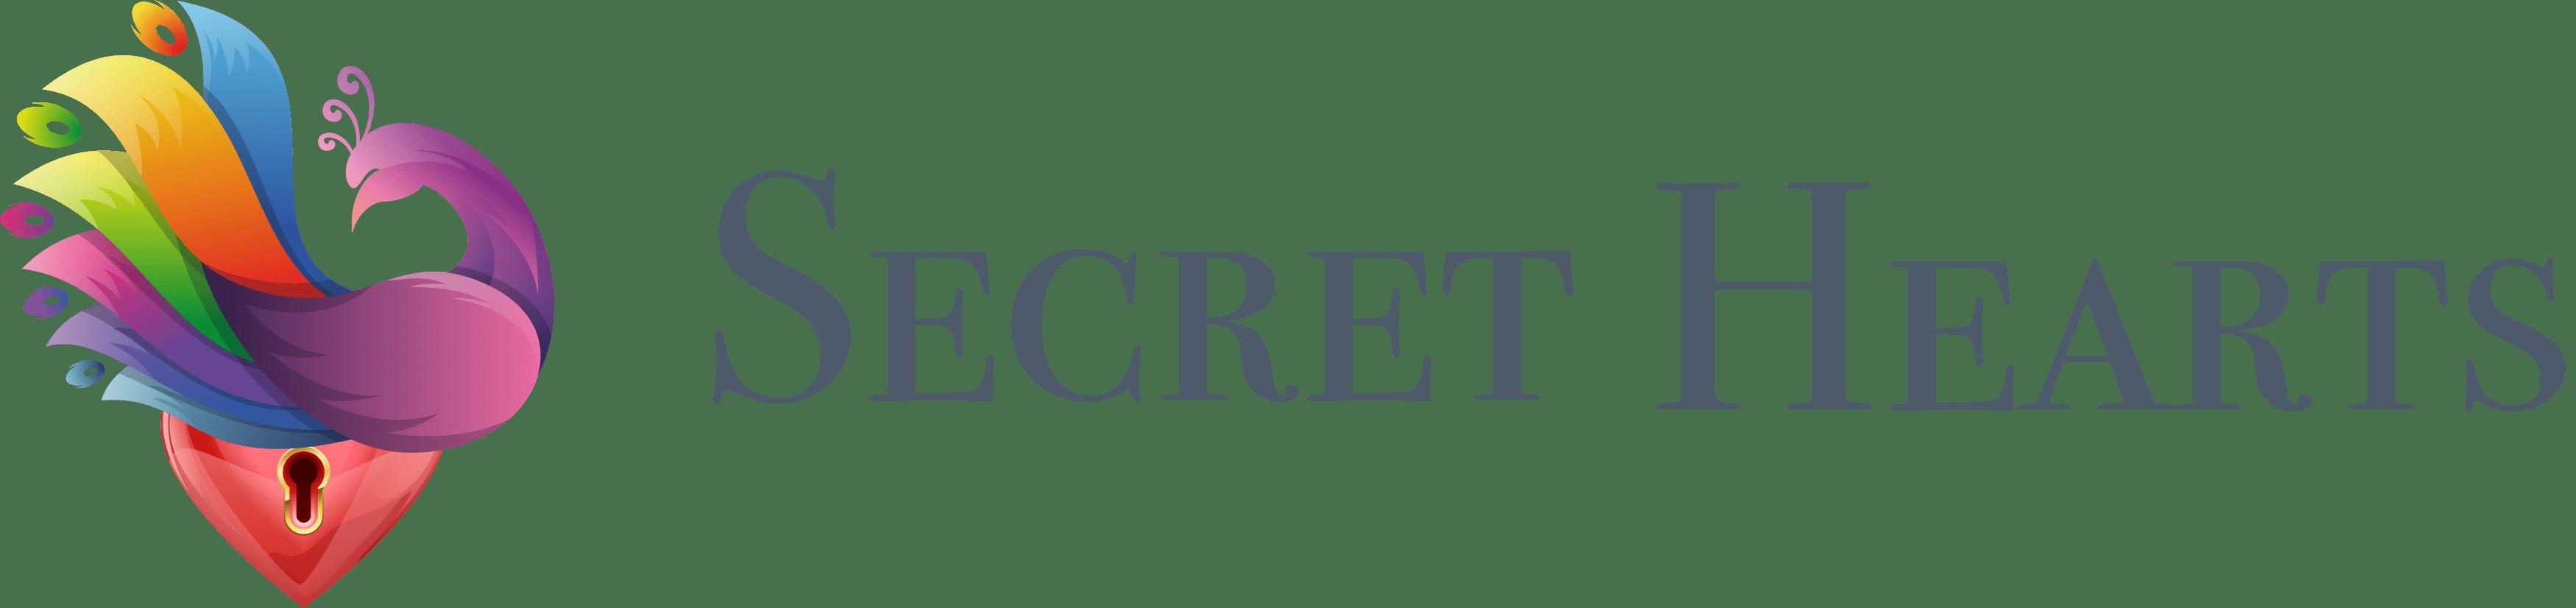 Secret Hearts|シークレットハーツ